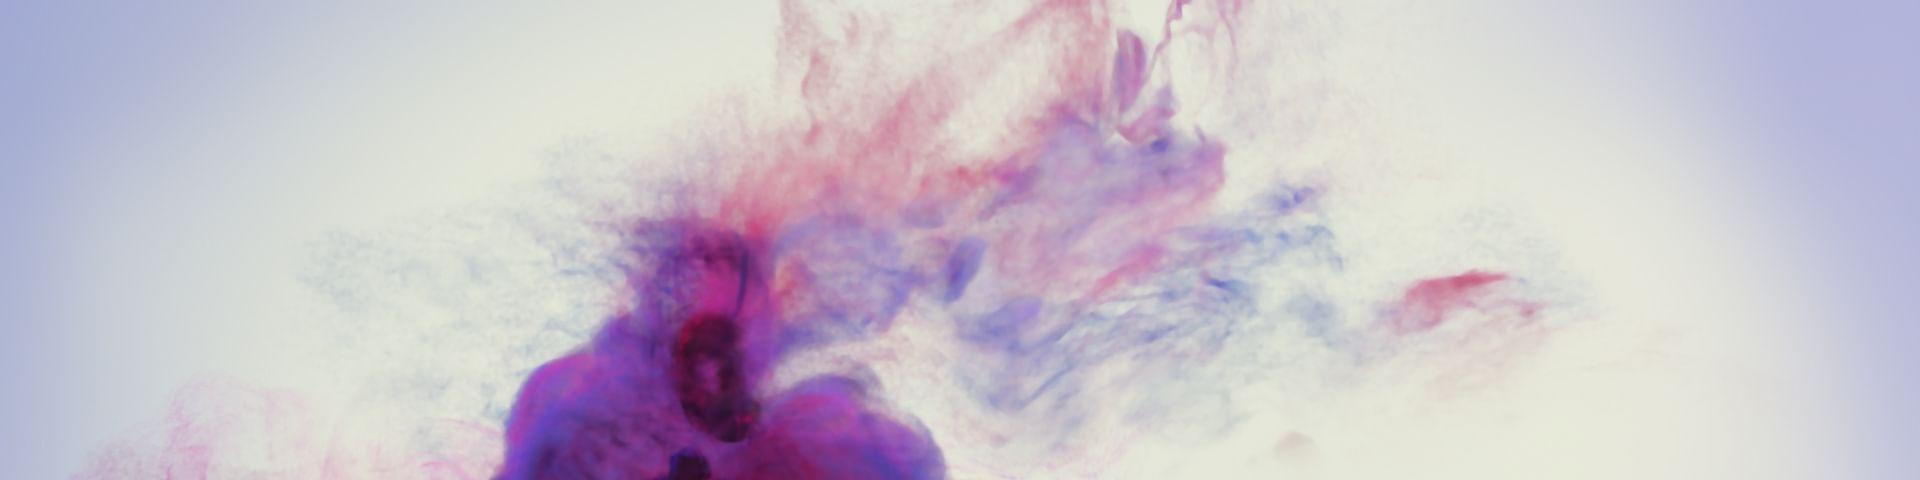 Algier - Mekka der Revolutionäre (1962-1974)